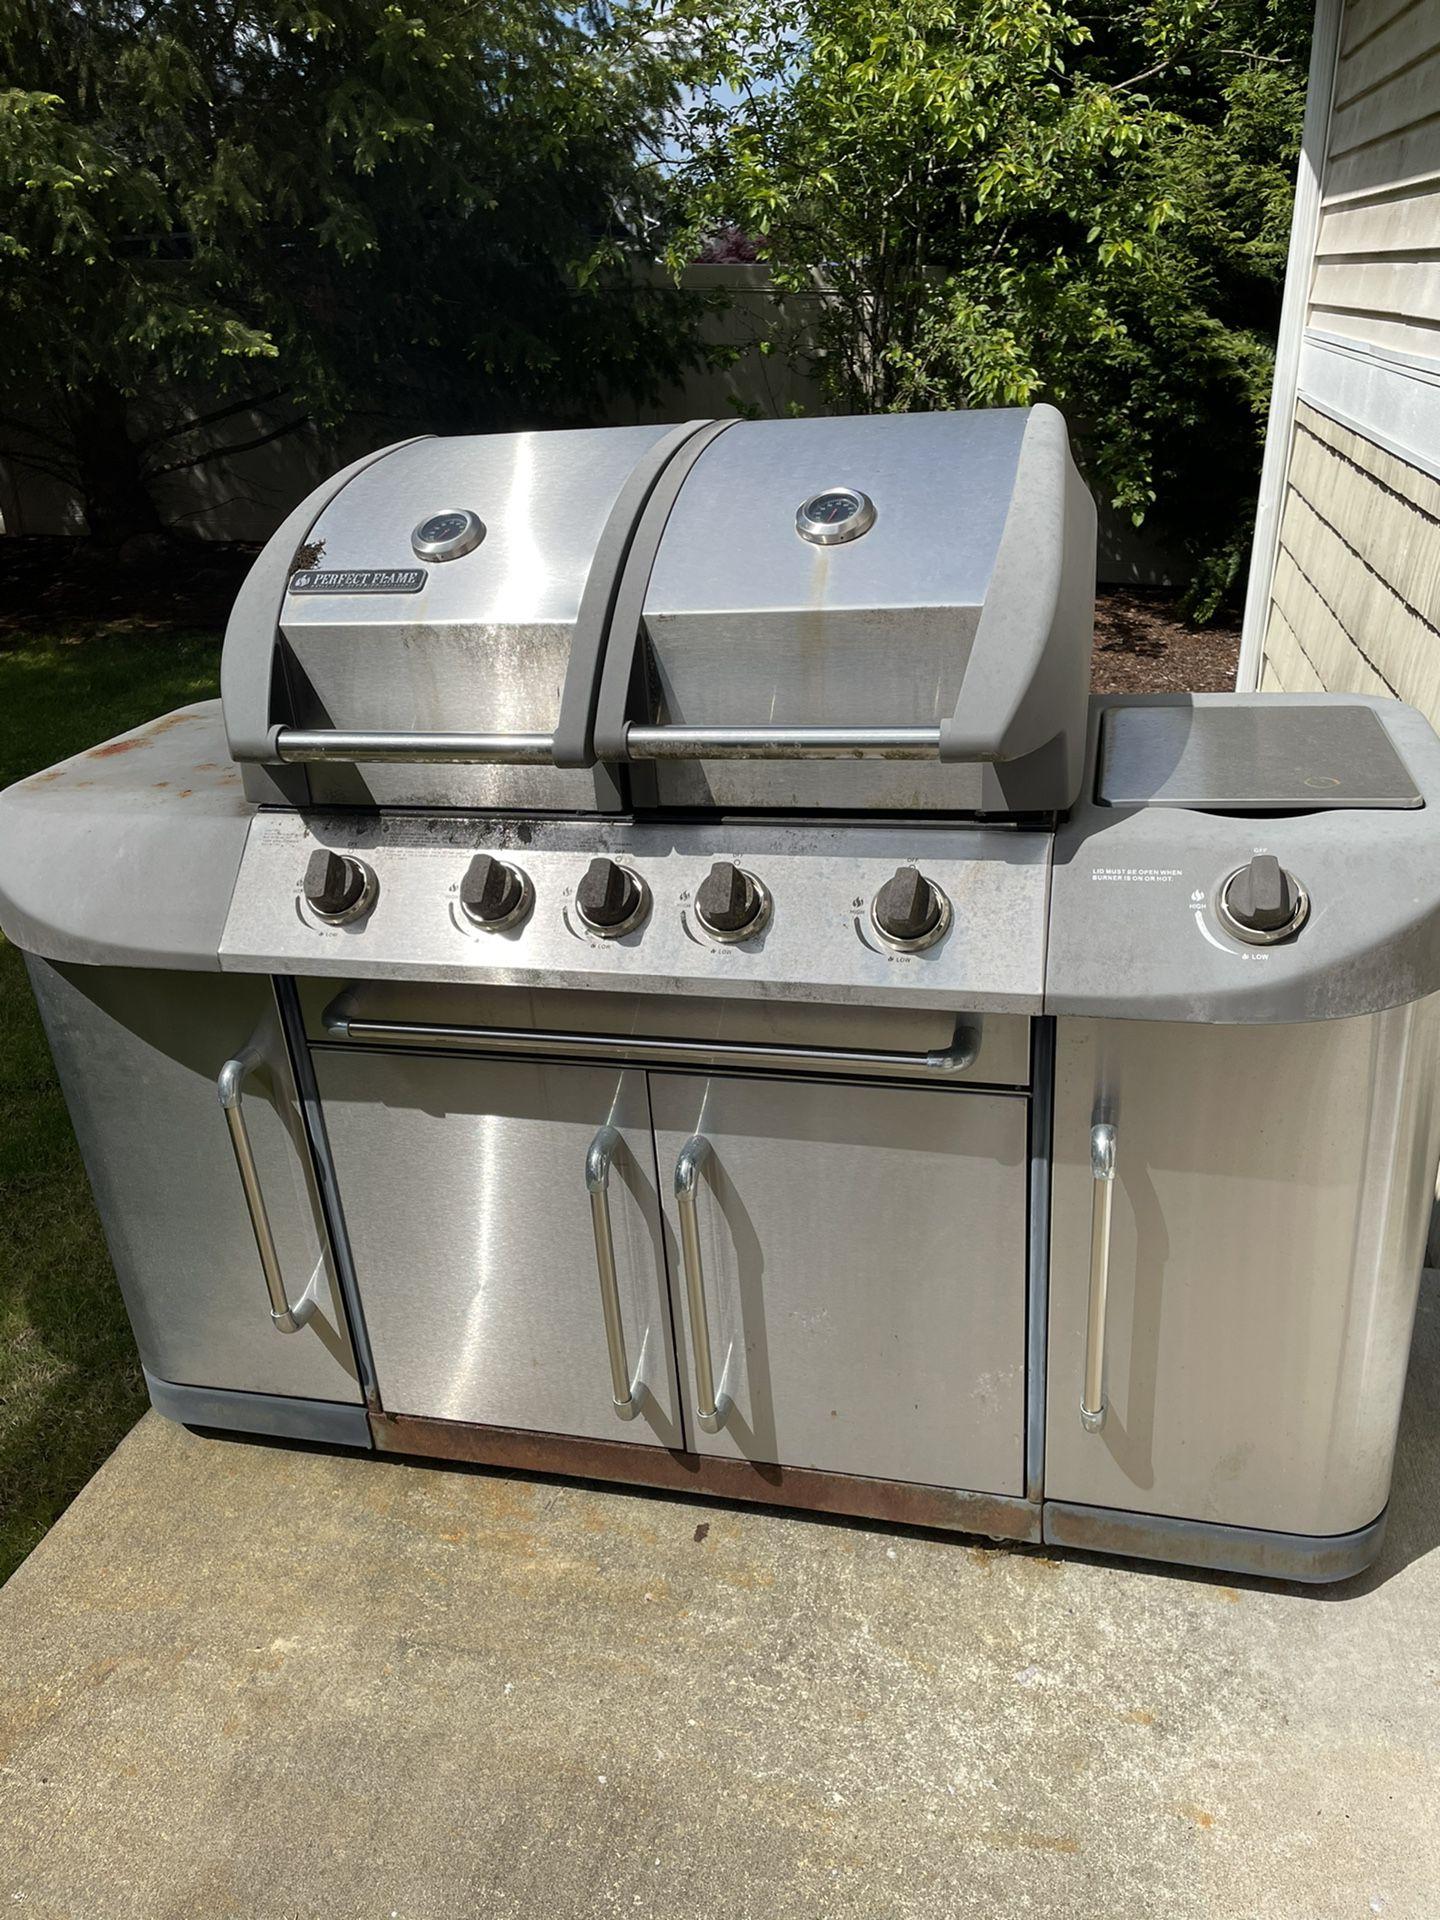 Free Barbecue Grill